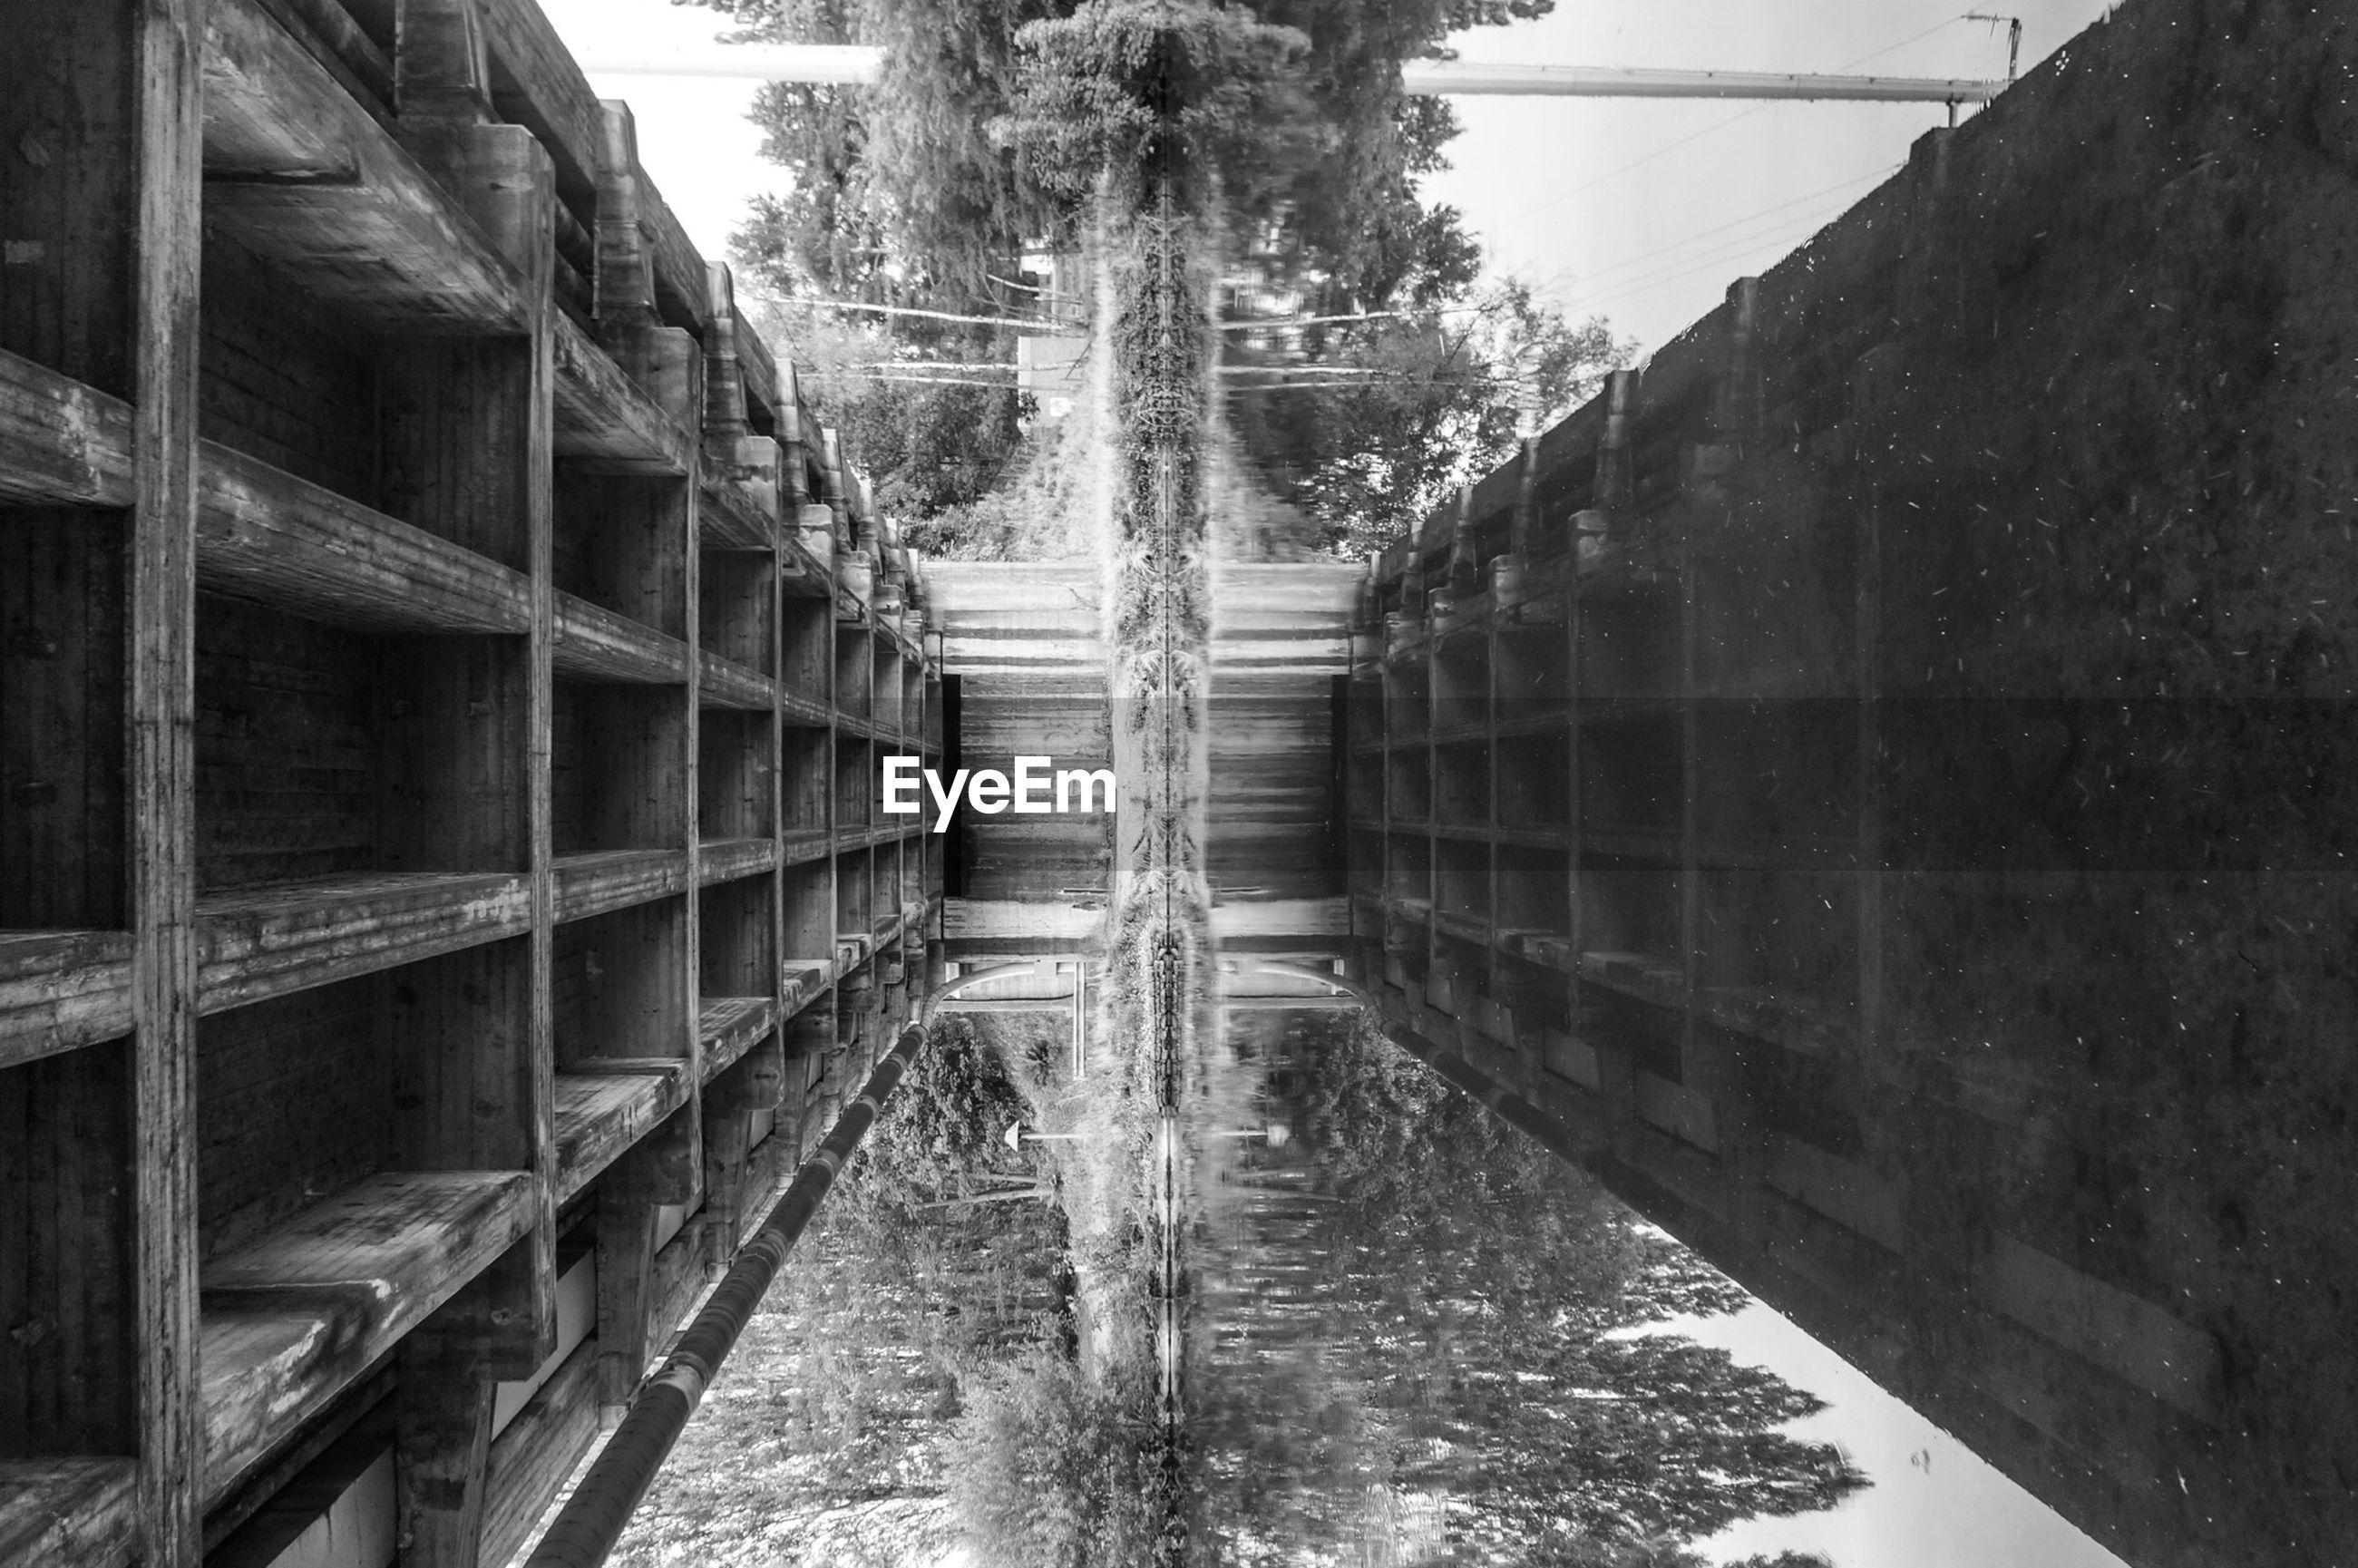 Reflection of wooden bridge in water